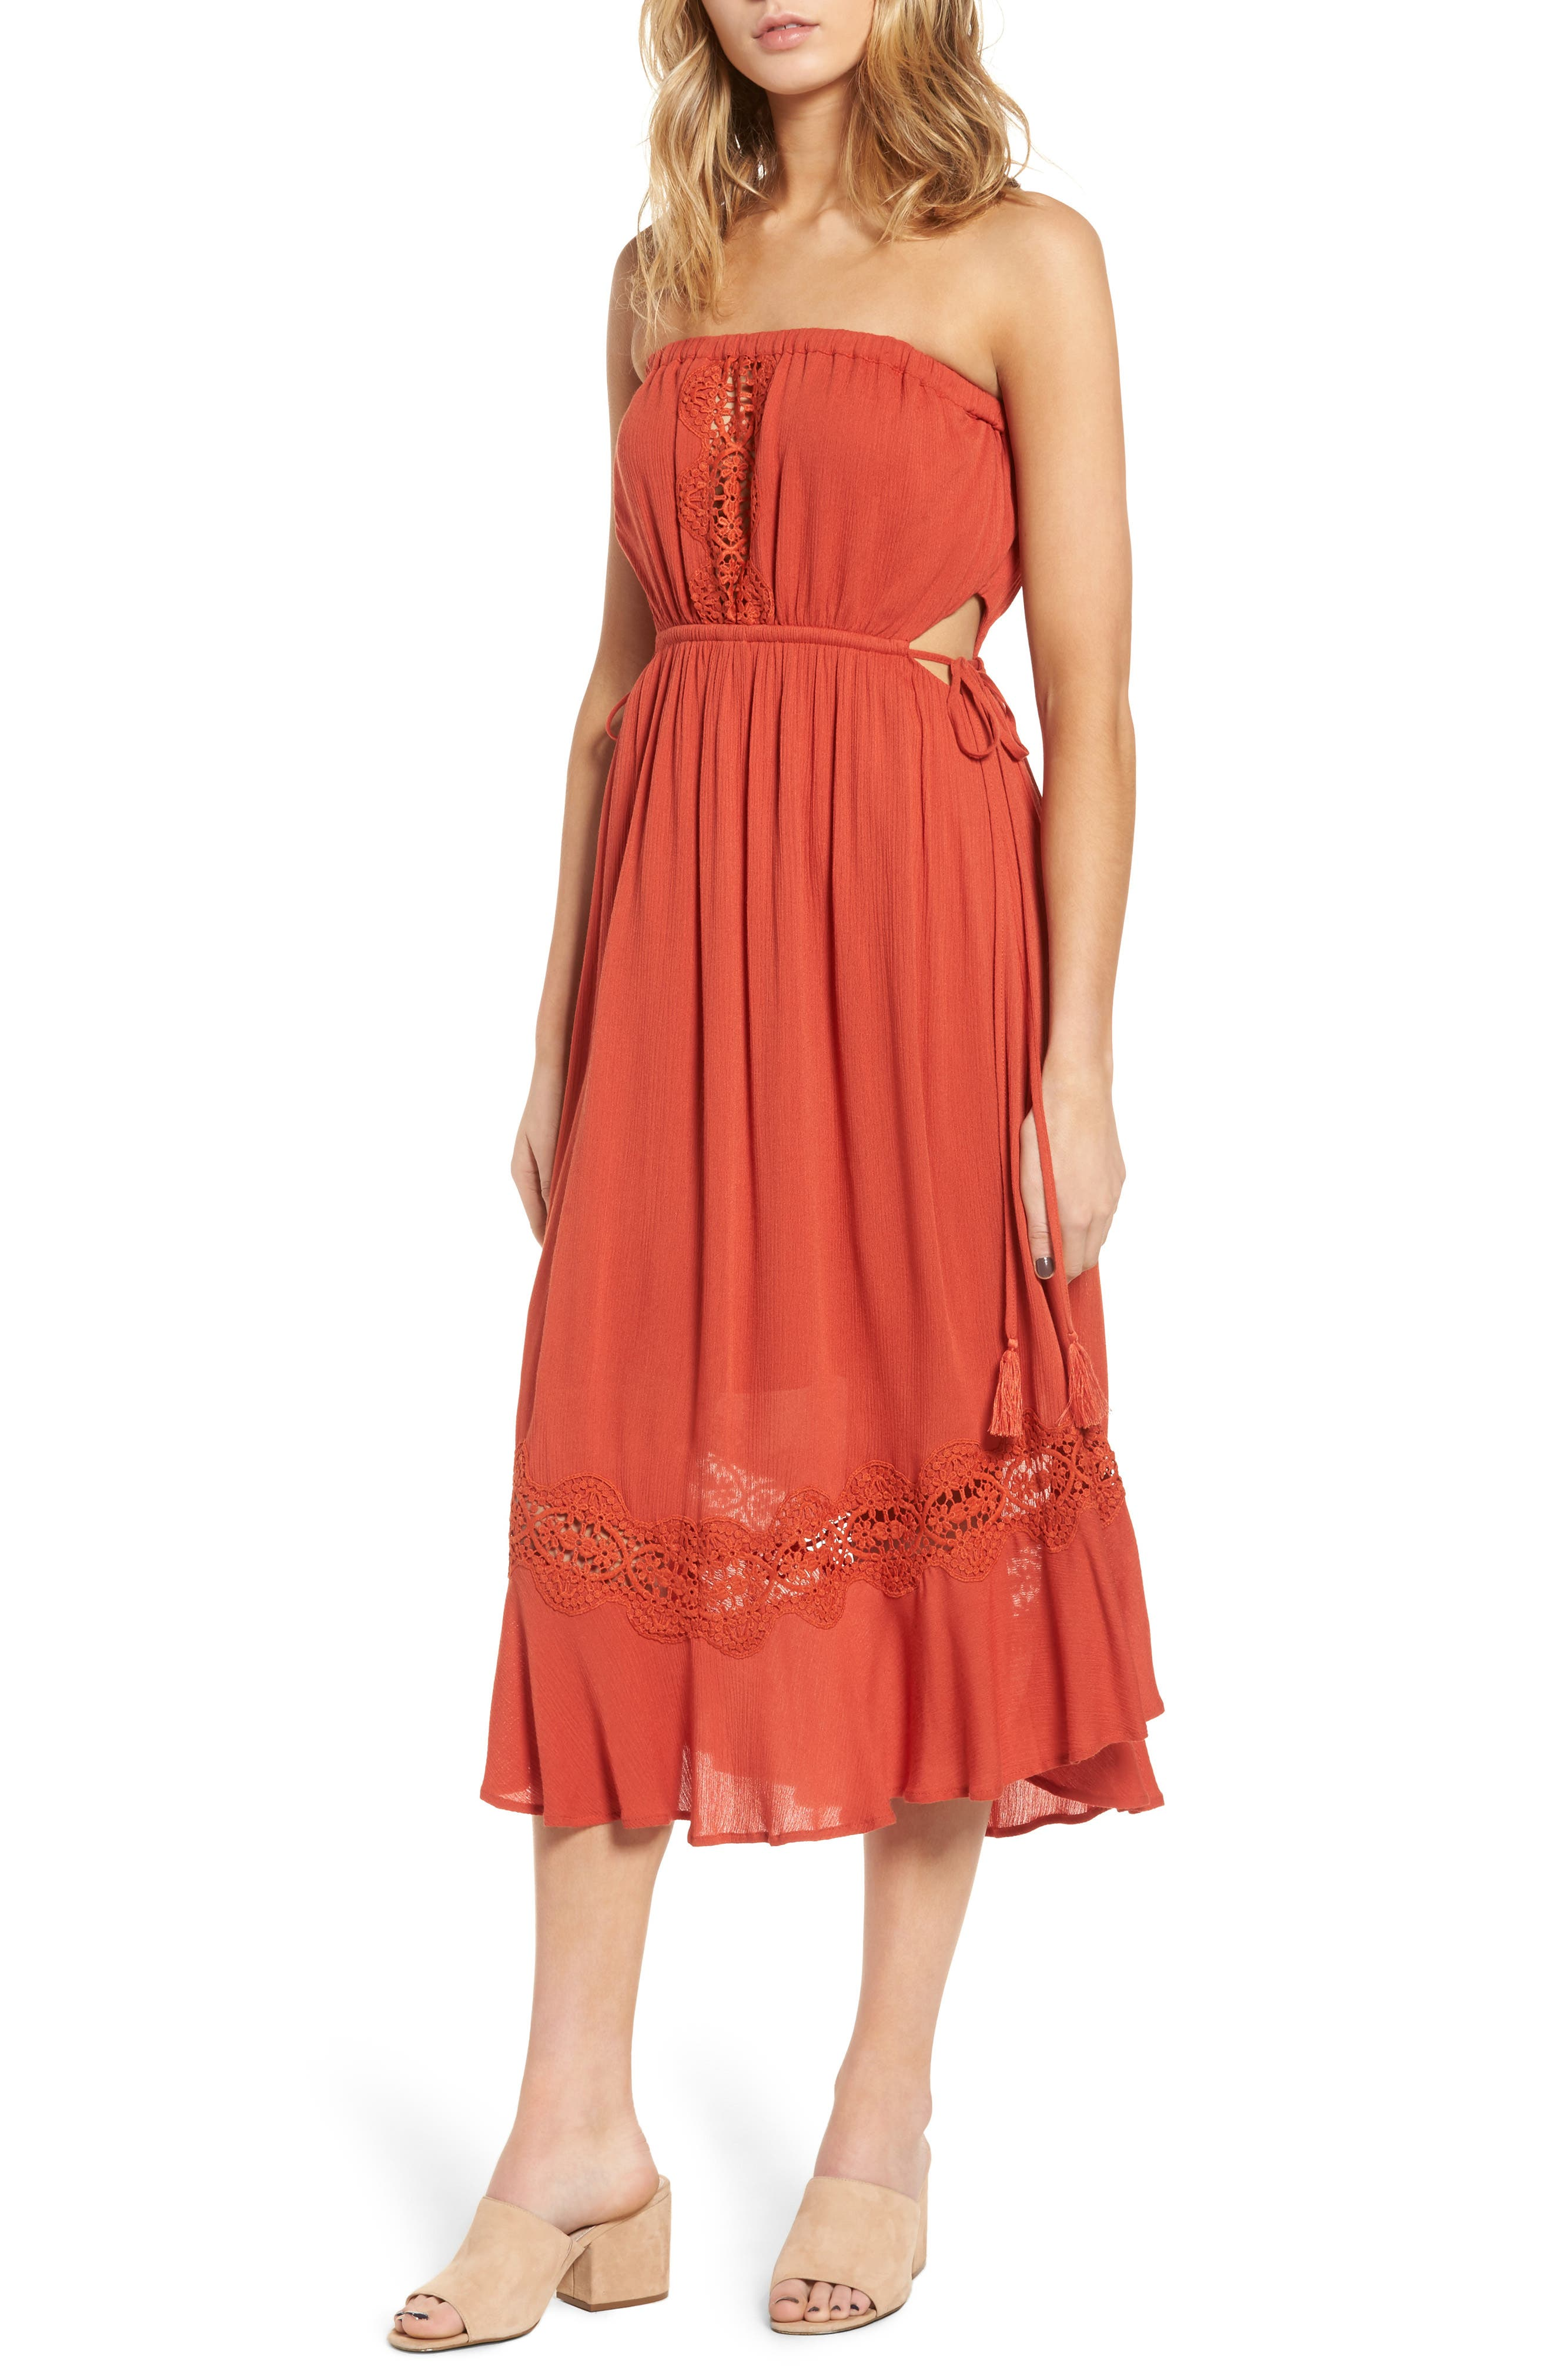 Lush Lace Inset Strapless Dress